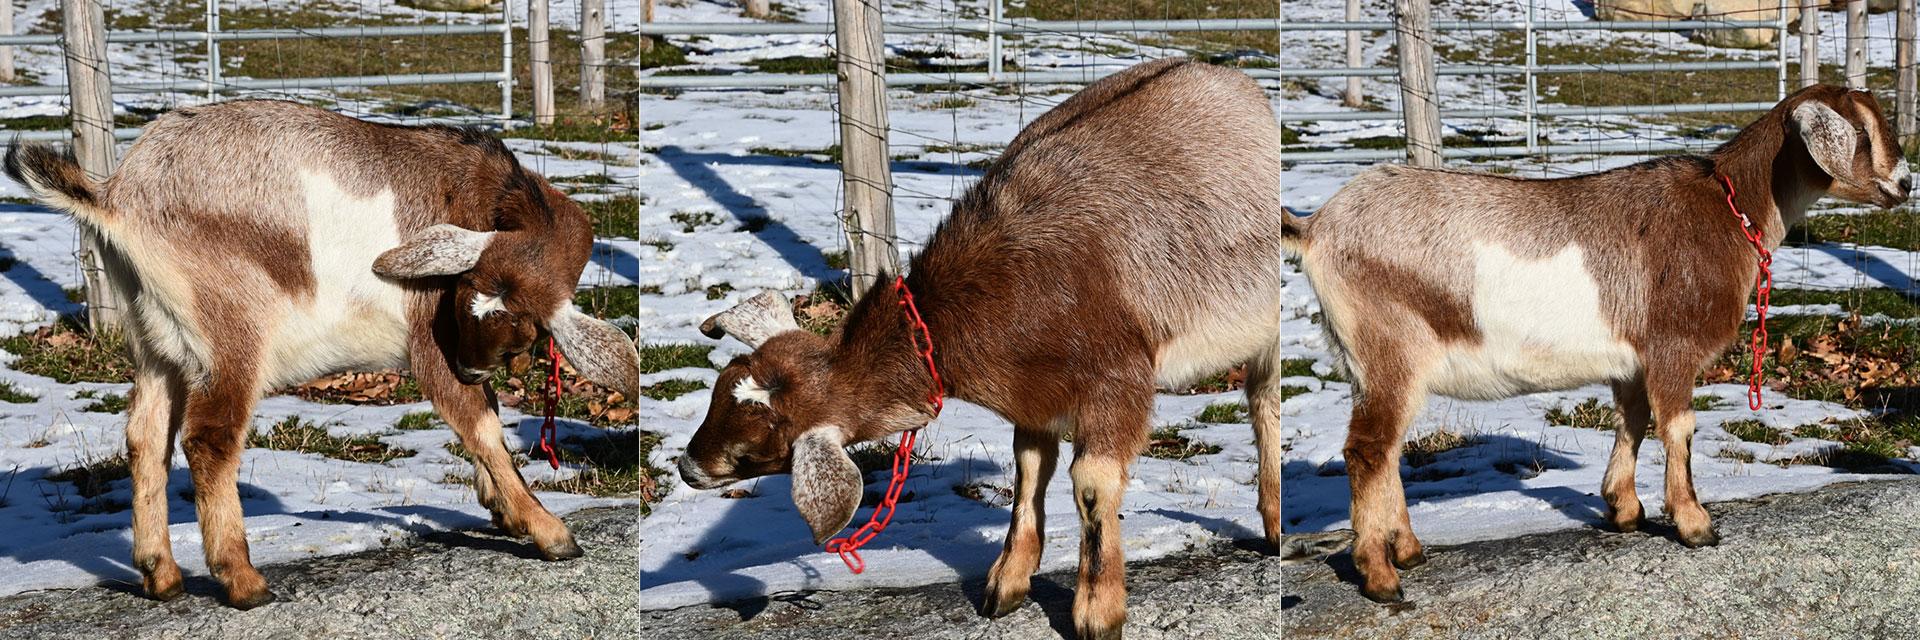 Goats at Three Charm Farm